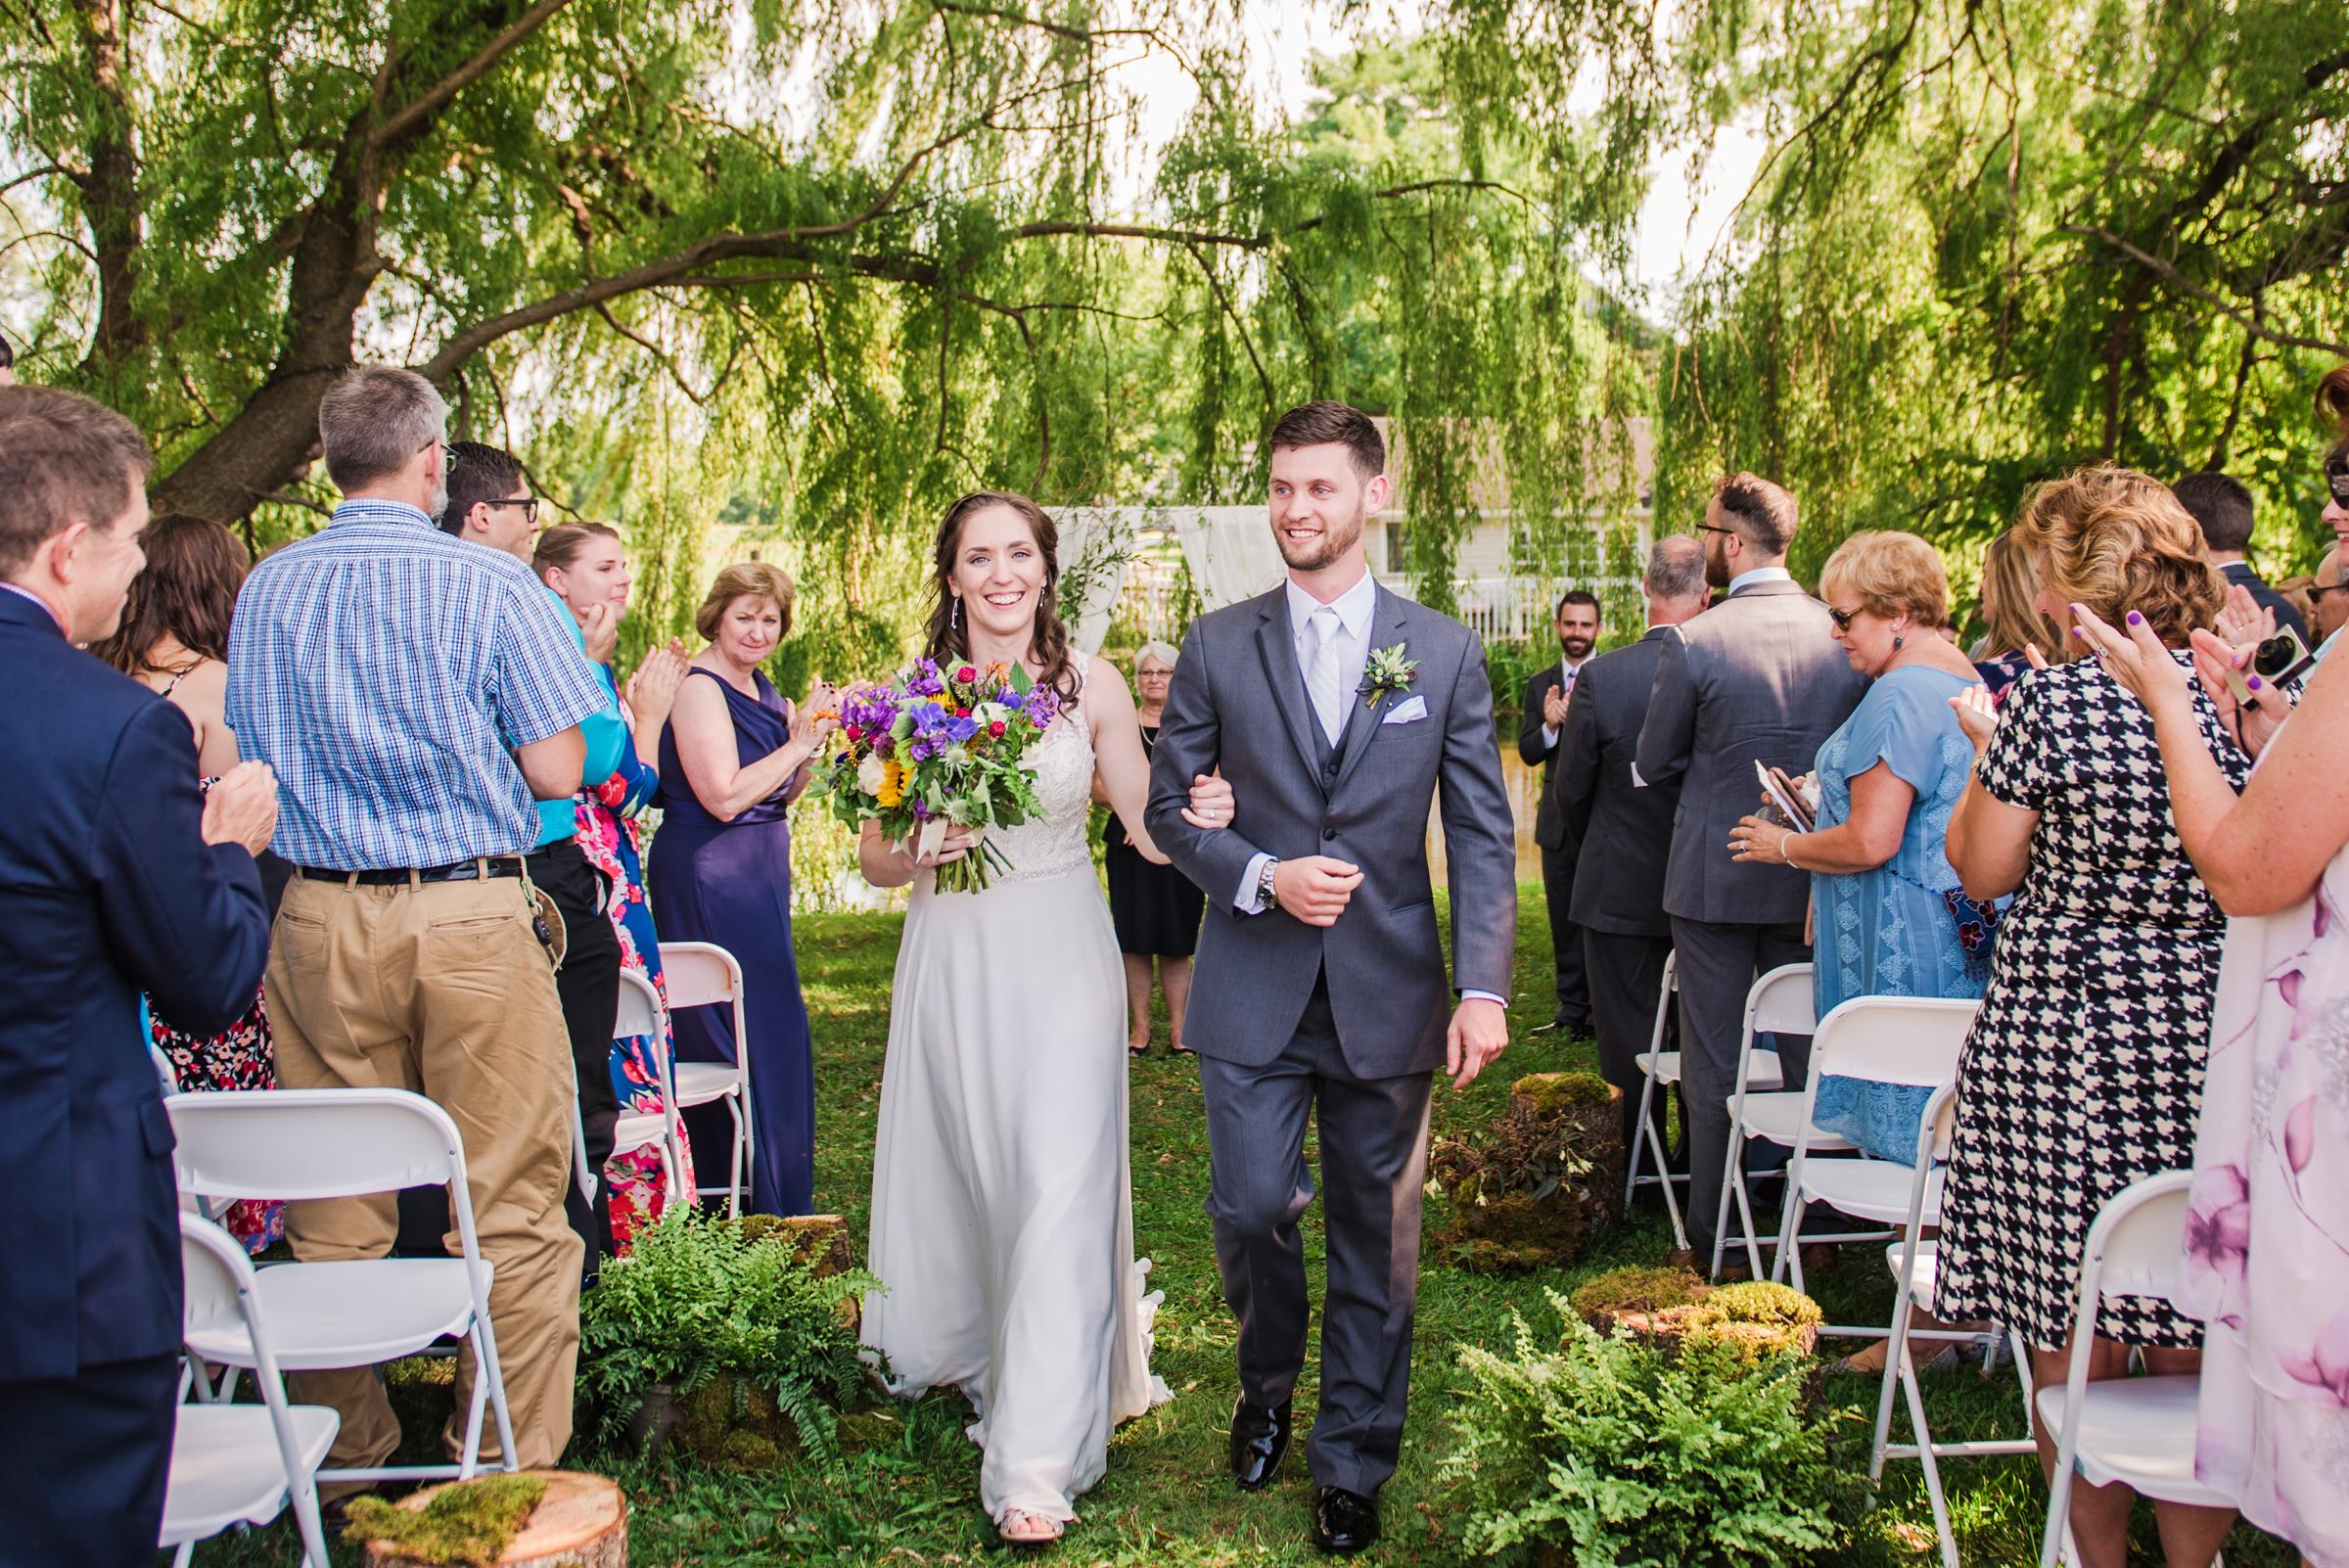 Jerris_Wadsworth_Wedding_Barn_Rochester_Wedding_JILL_STUDIO_Rochester_NY_Photographer_DSC_2705.jpg